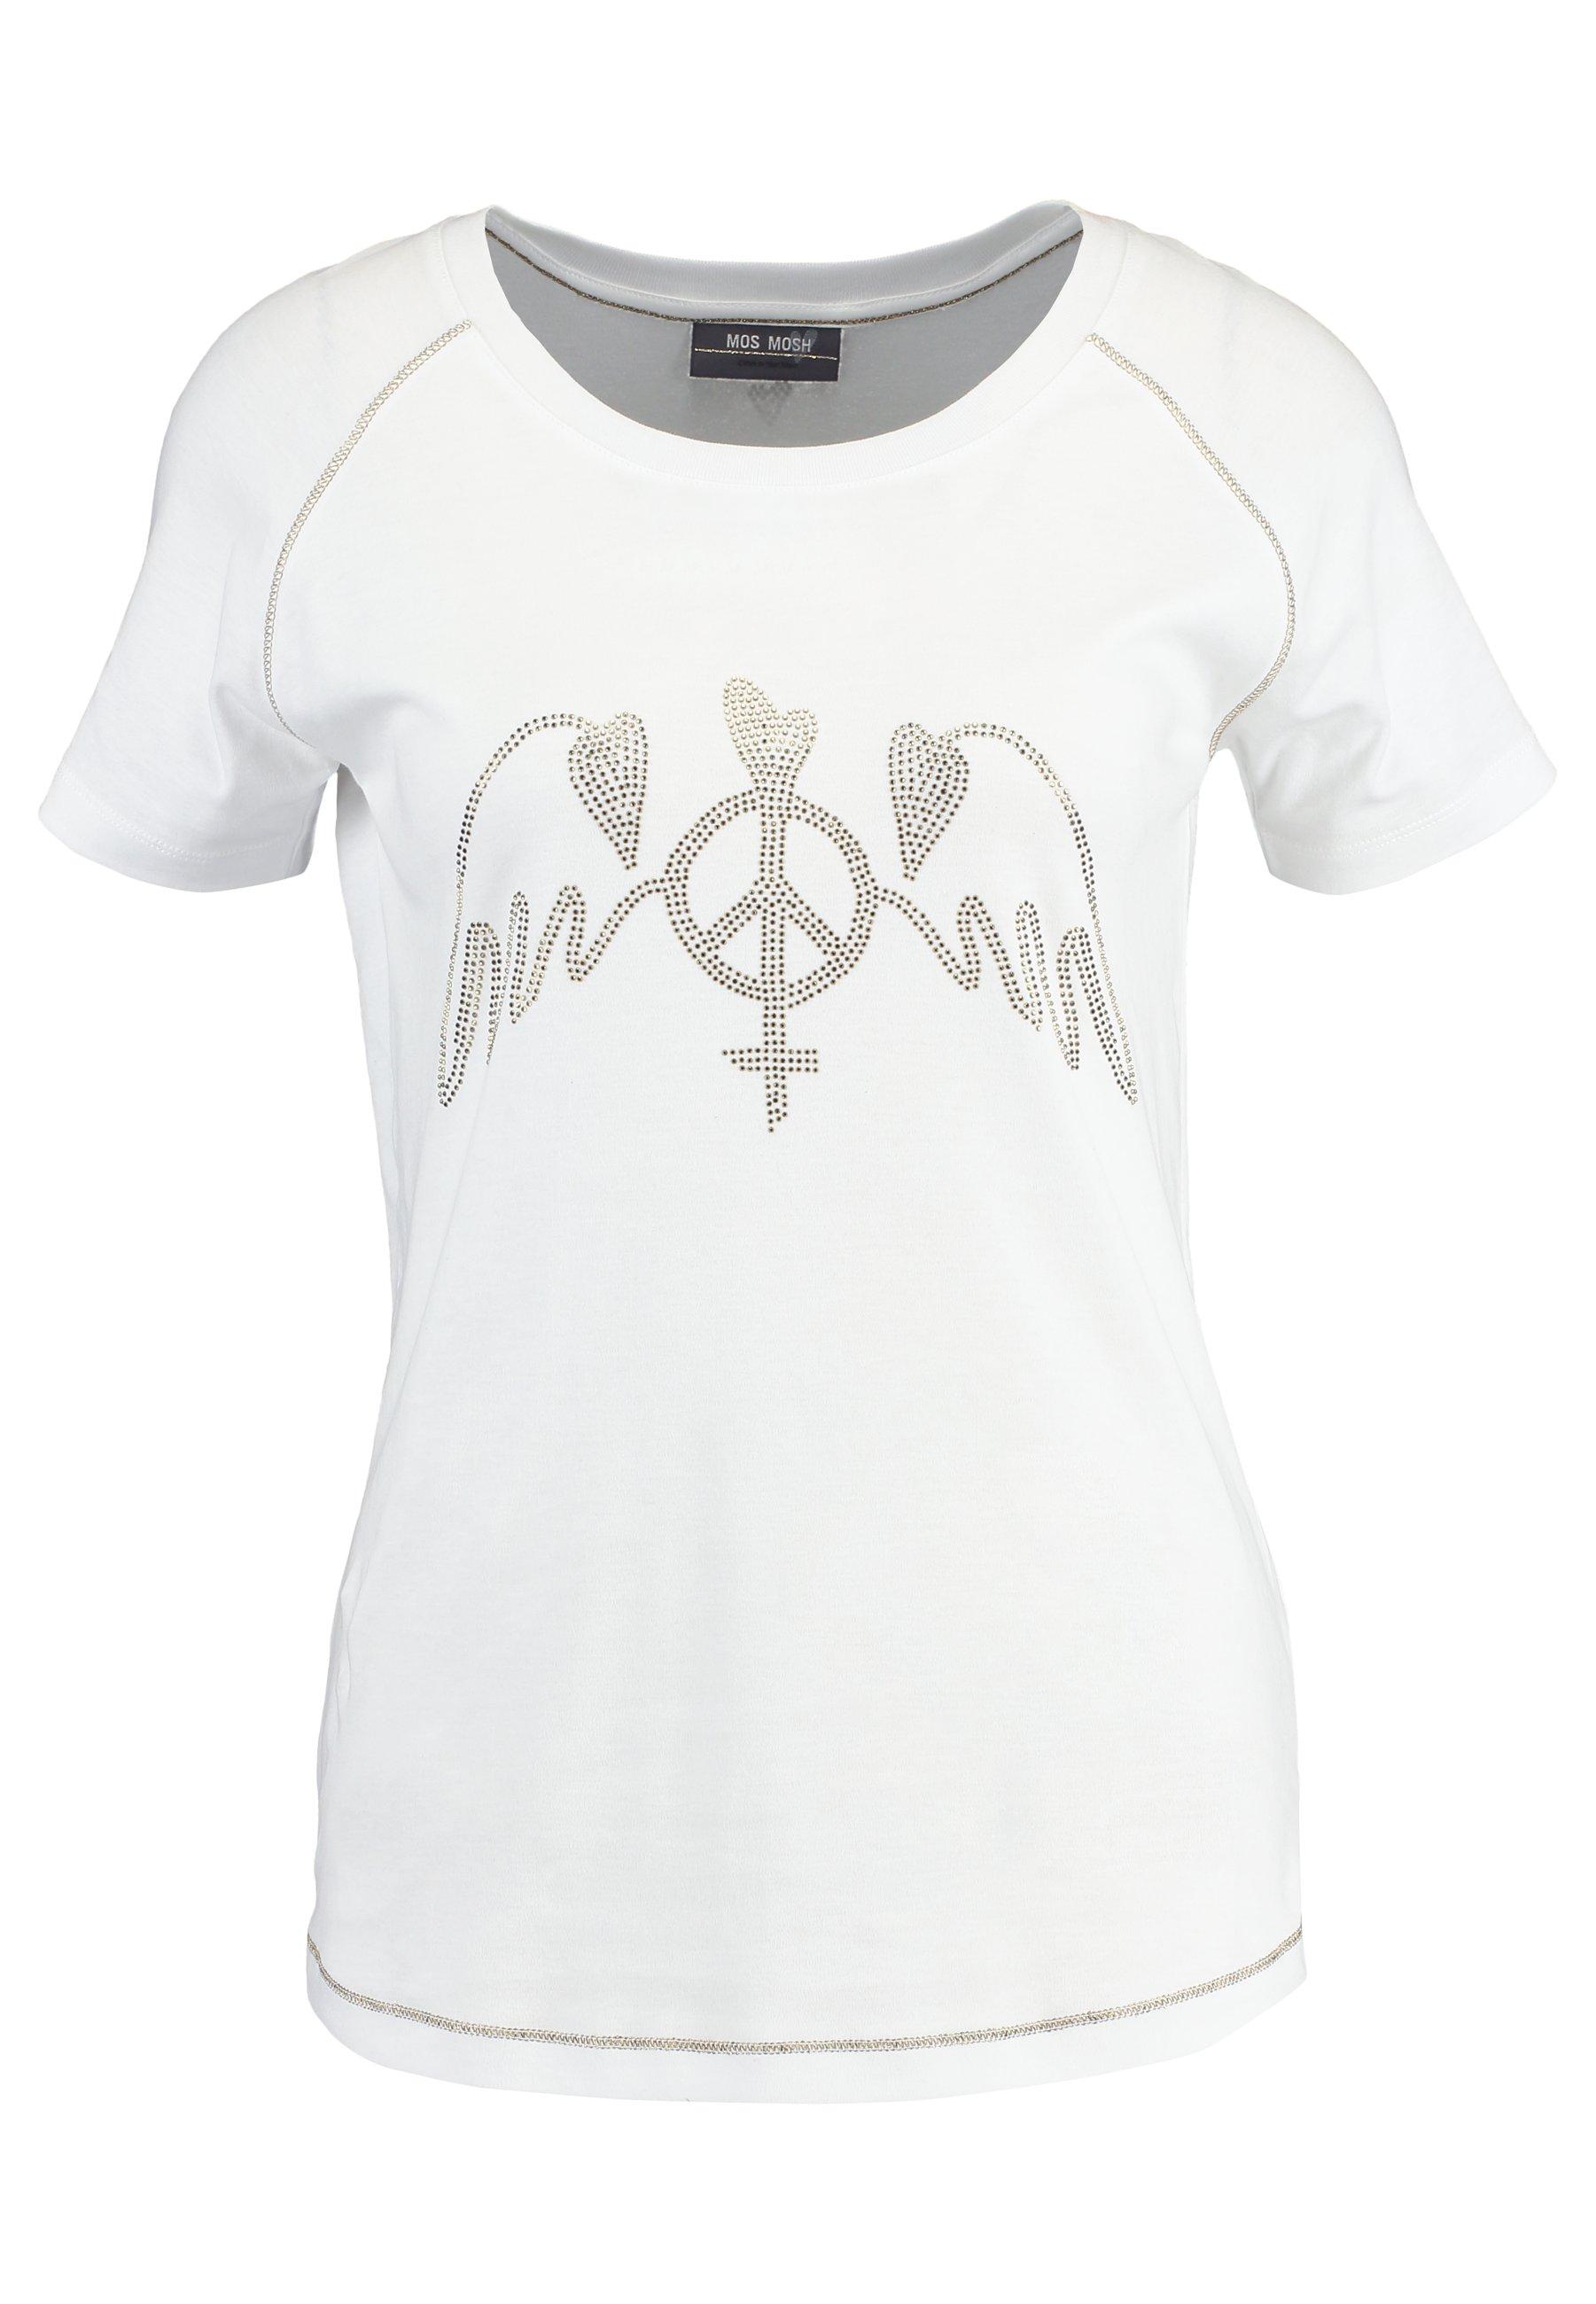 Mos Mosh Mag Tee - T-shirt Print White